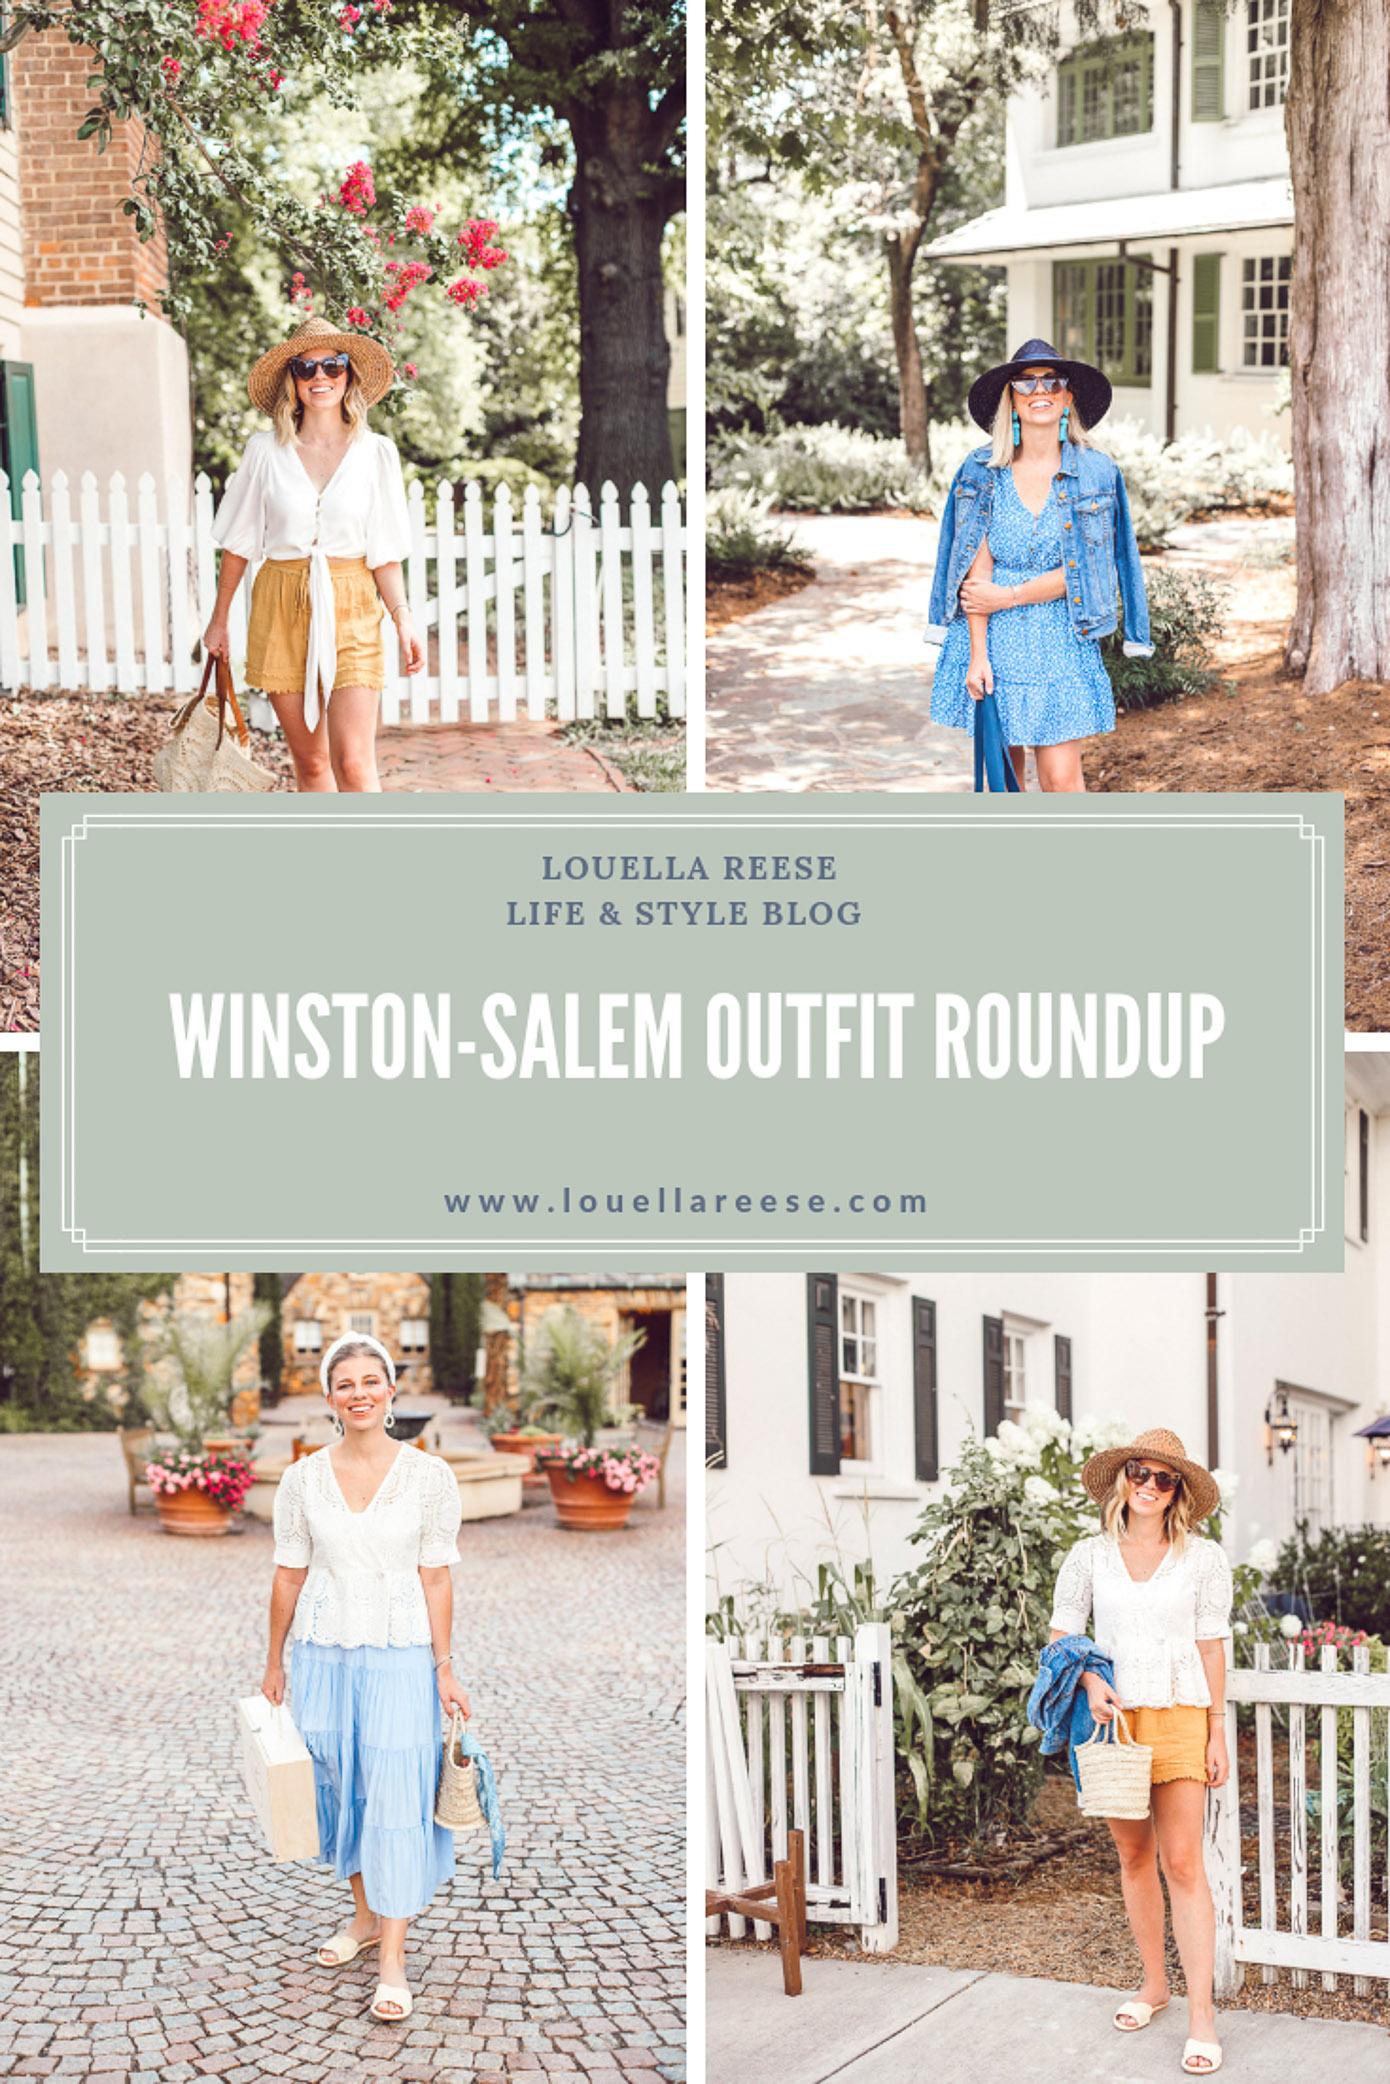 Winston-Salem Outfits - Everything I wore to explore Winston-Salem | Louella Reese